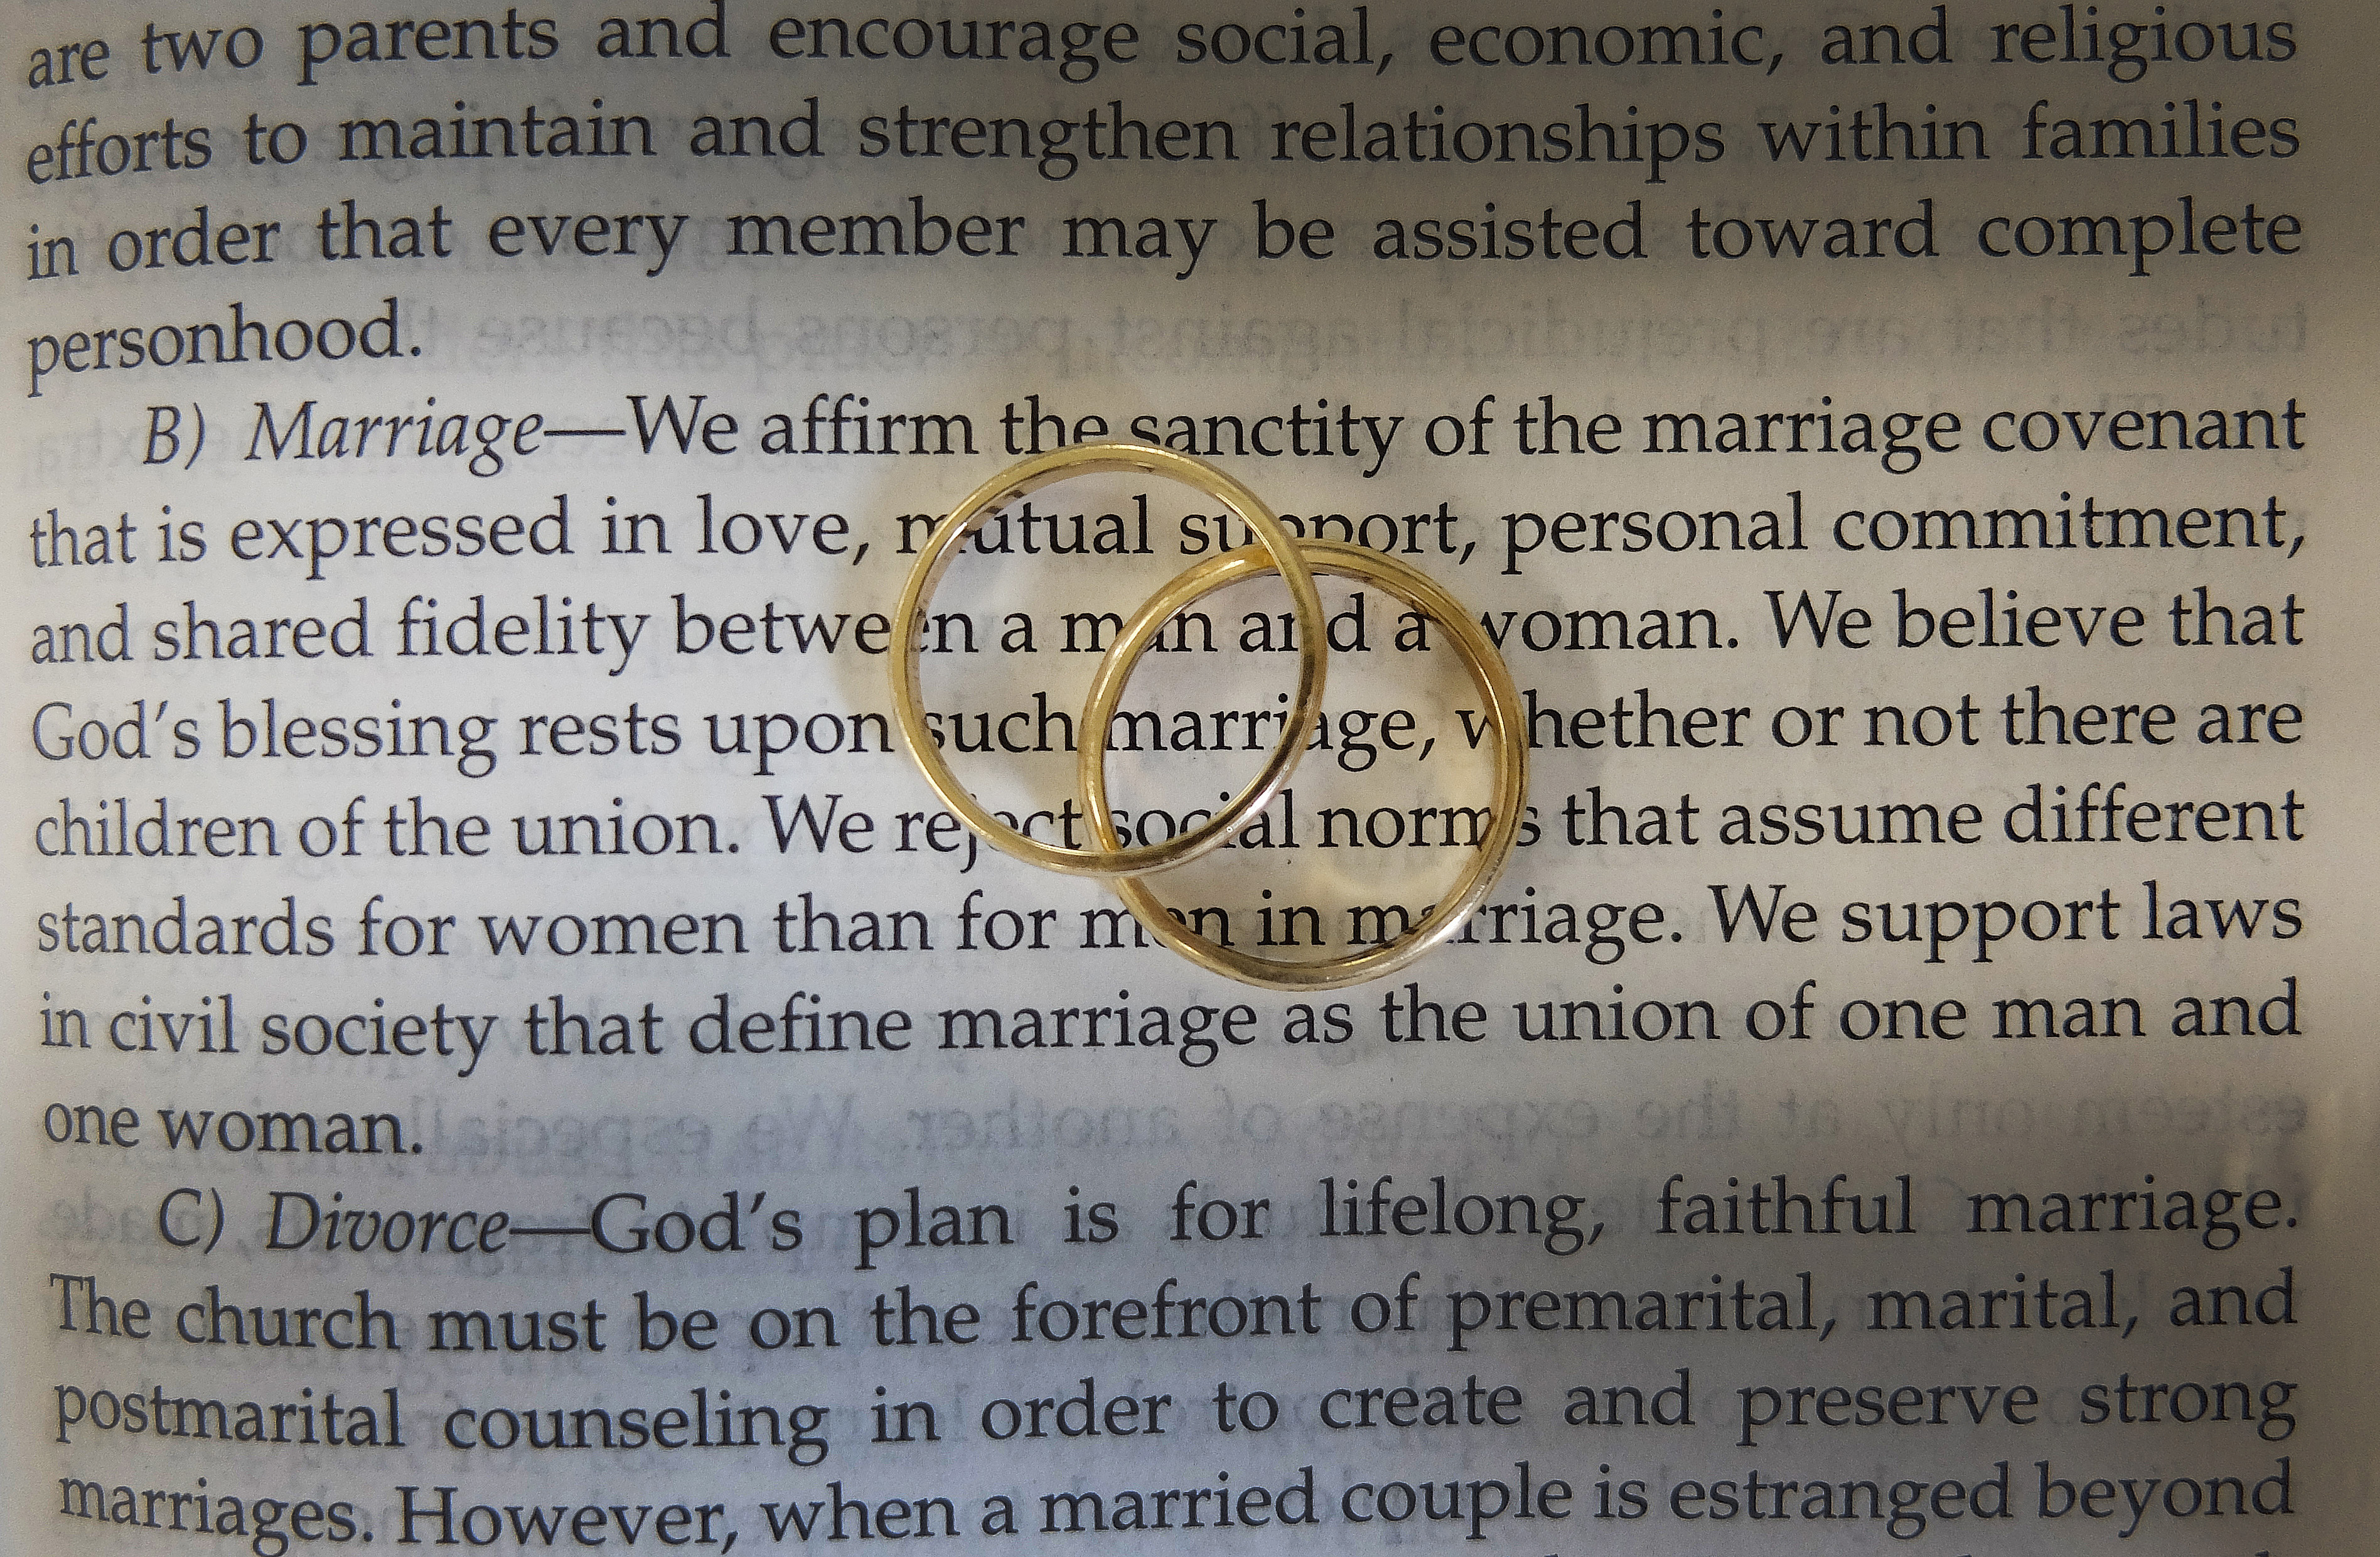 from Cody church discipline heresy gays